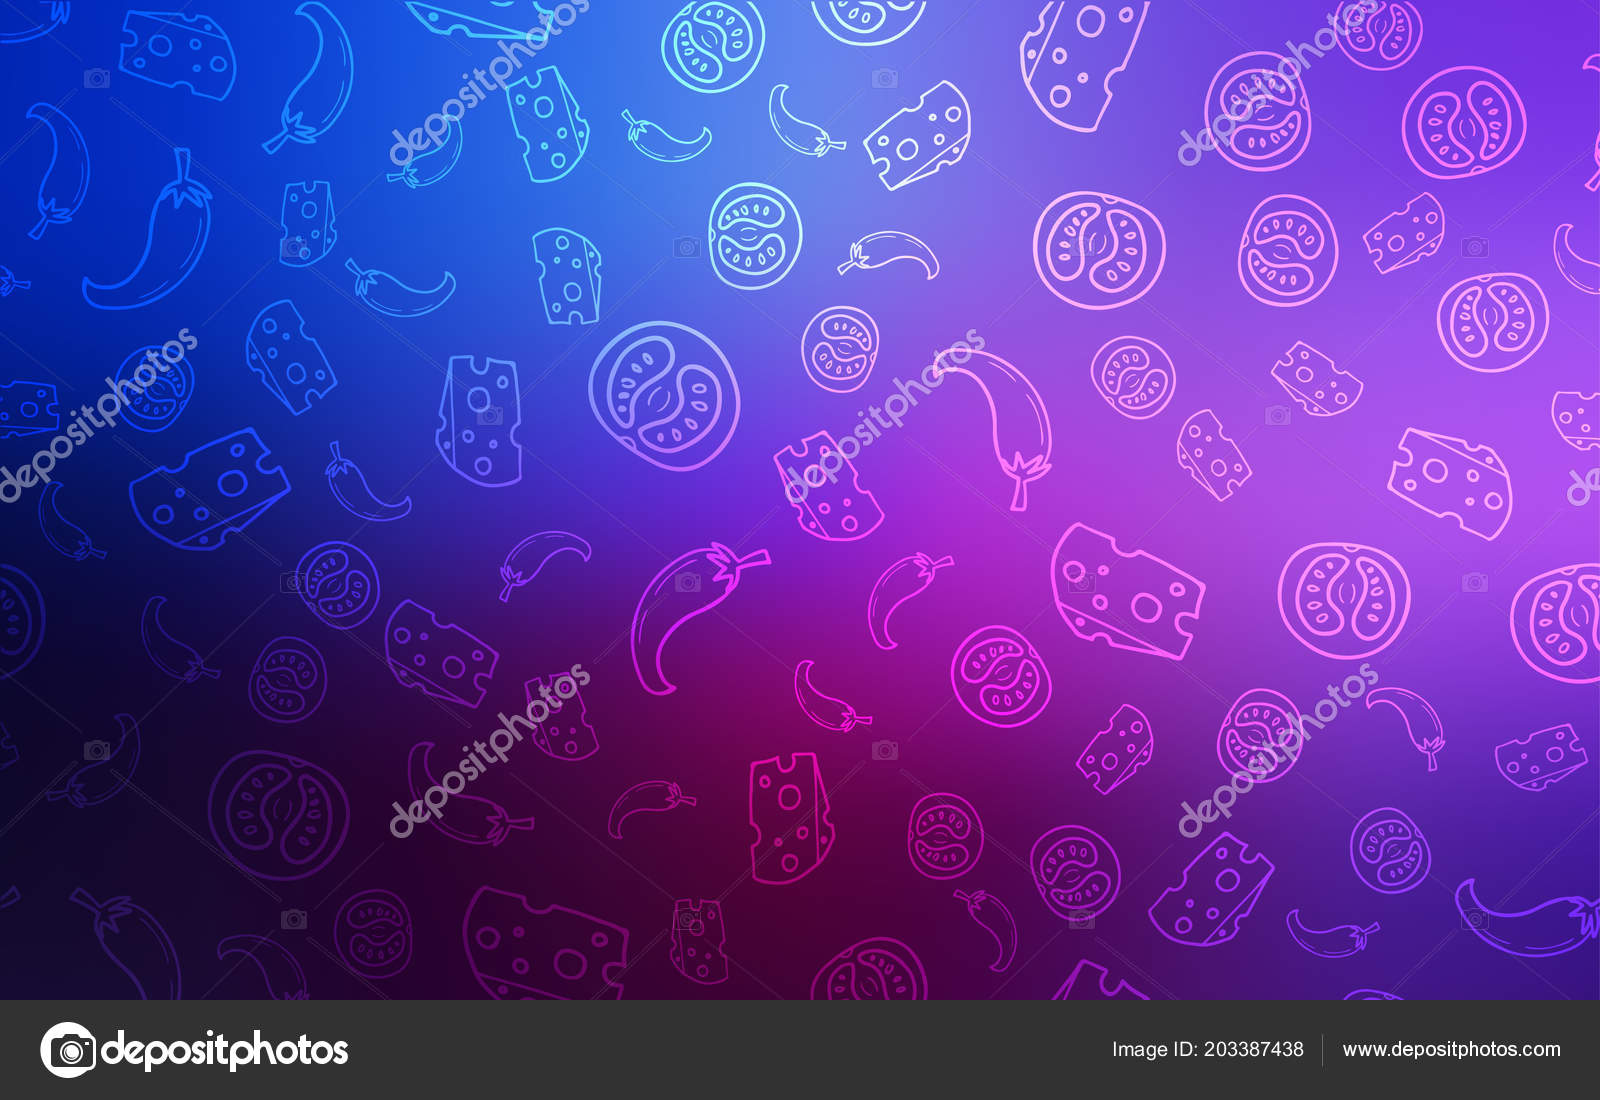 Dark Pink Blue Vector Layout Restaurant Food Illustration Set Fresh Stock Vector C Smaria 203387438